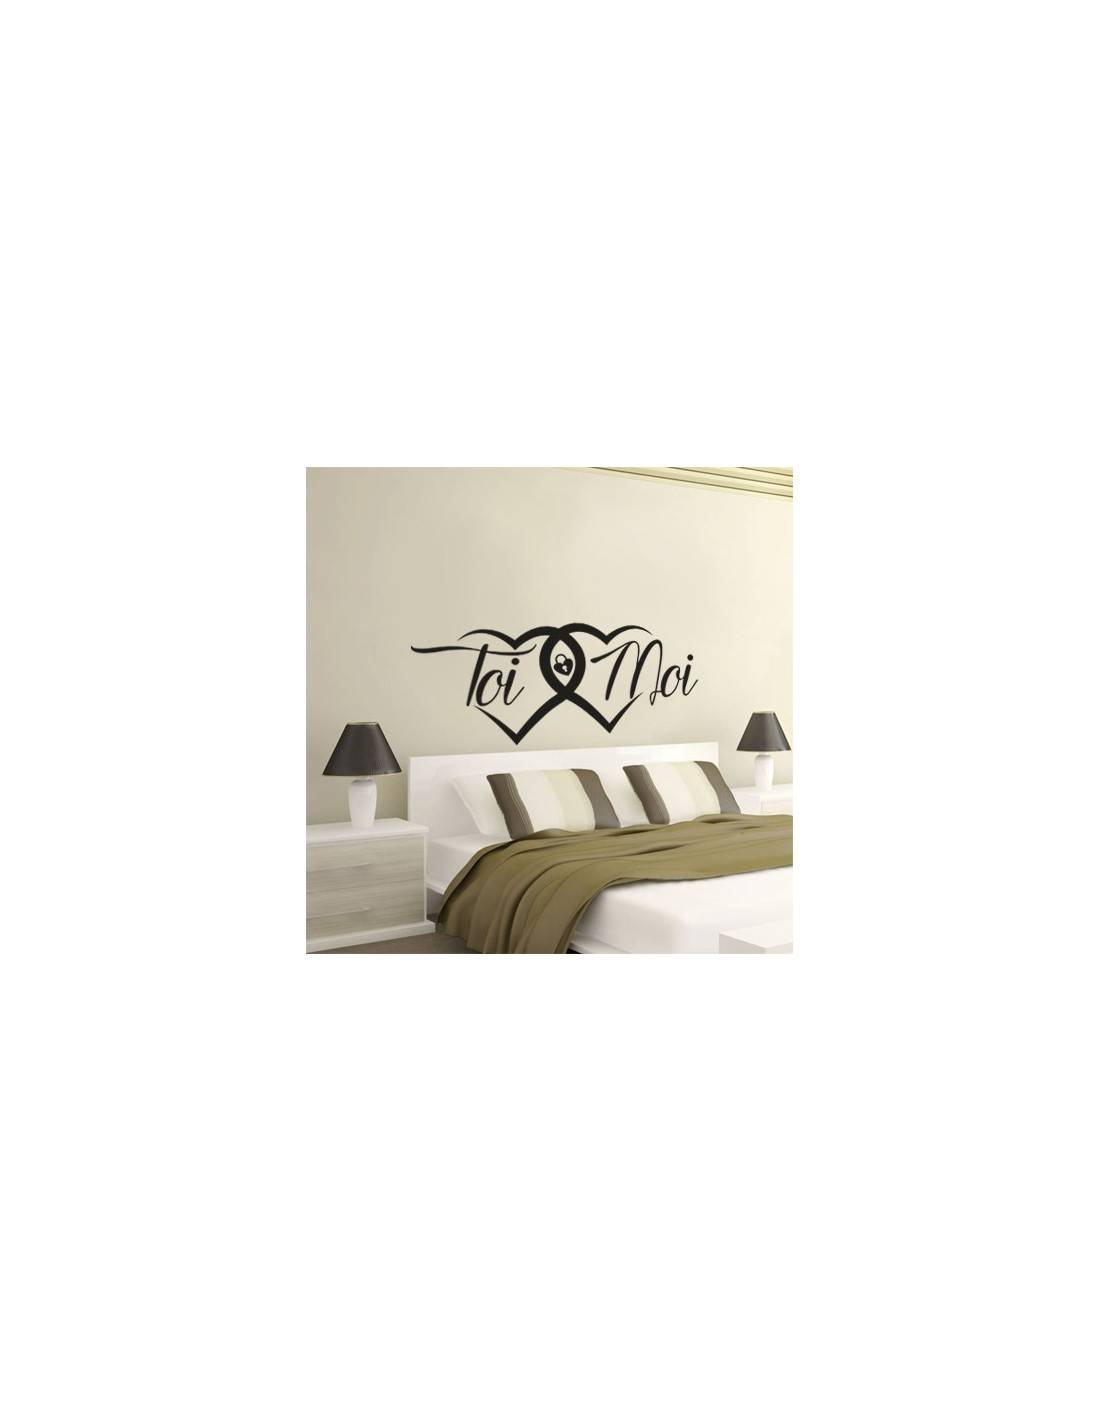 leroy merlin 3d salle de bain. Black Bedroom Furniture Sets. Home Design Ideas